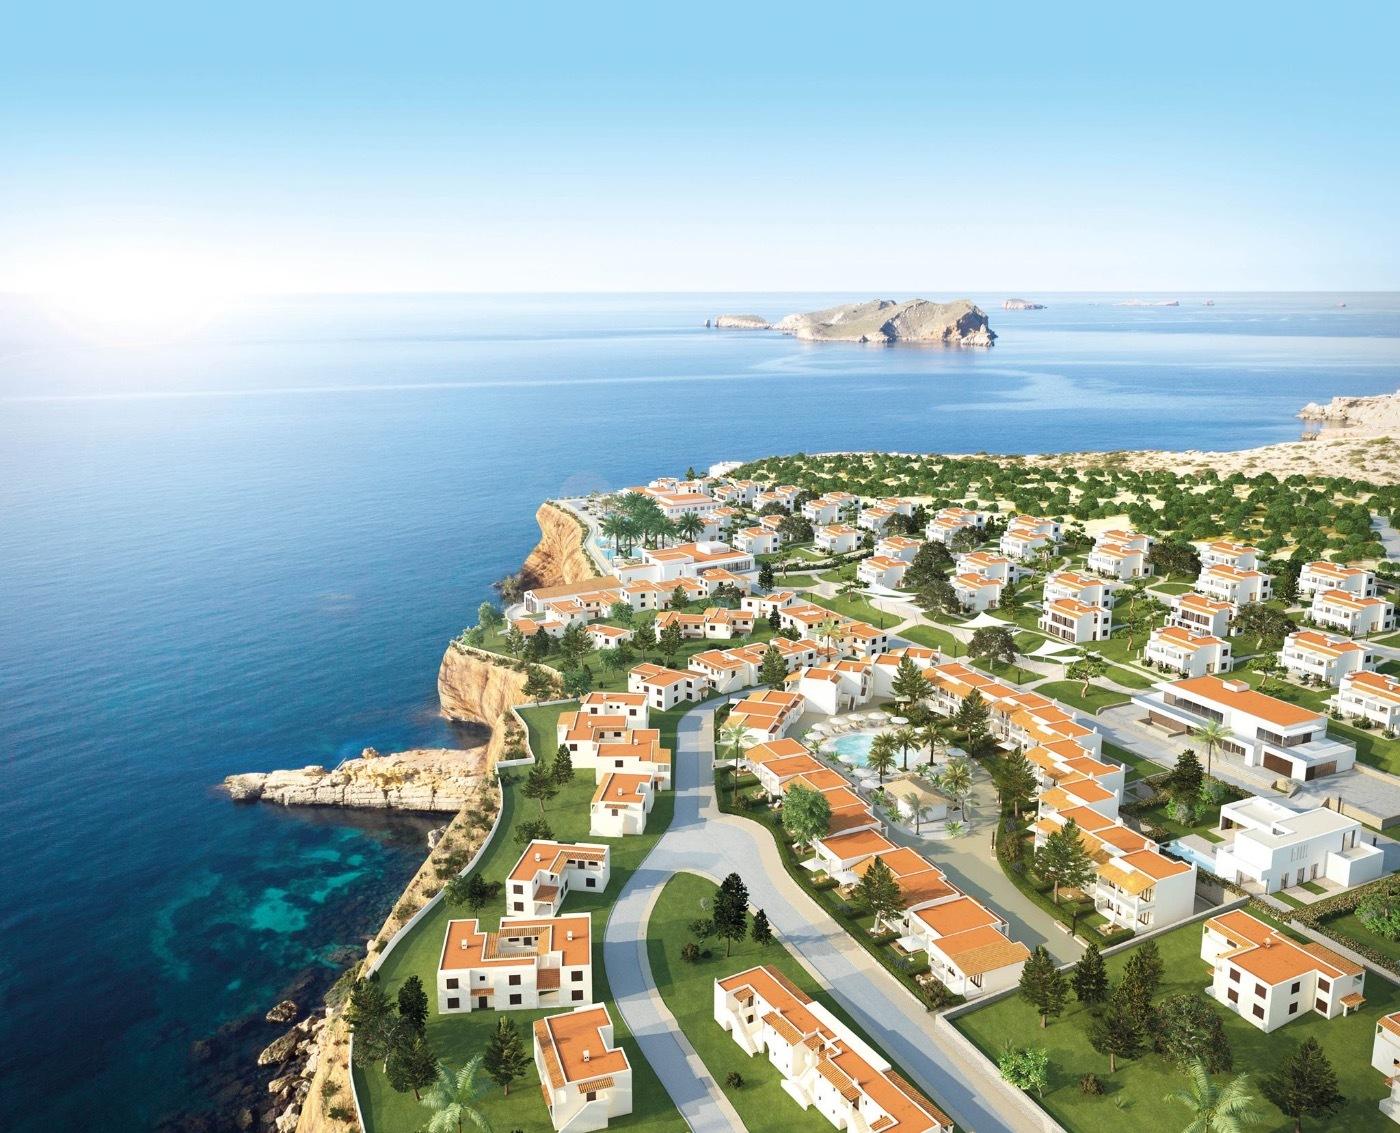 7 Pines Resort Ibiza (Opening 2018)